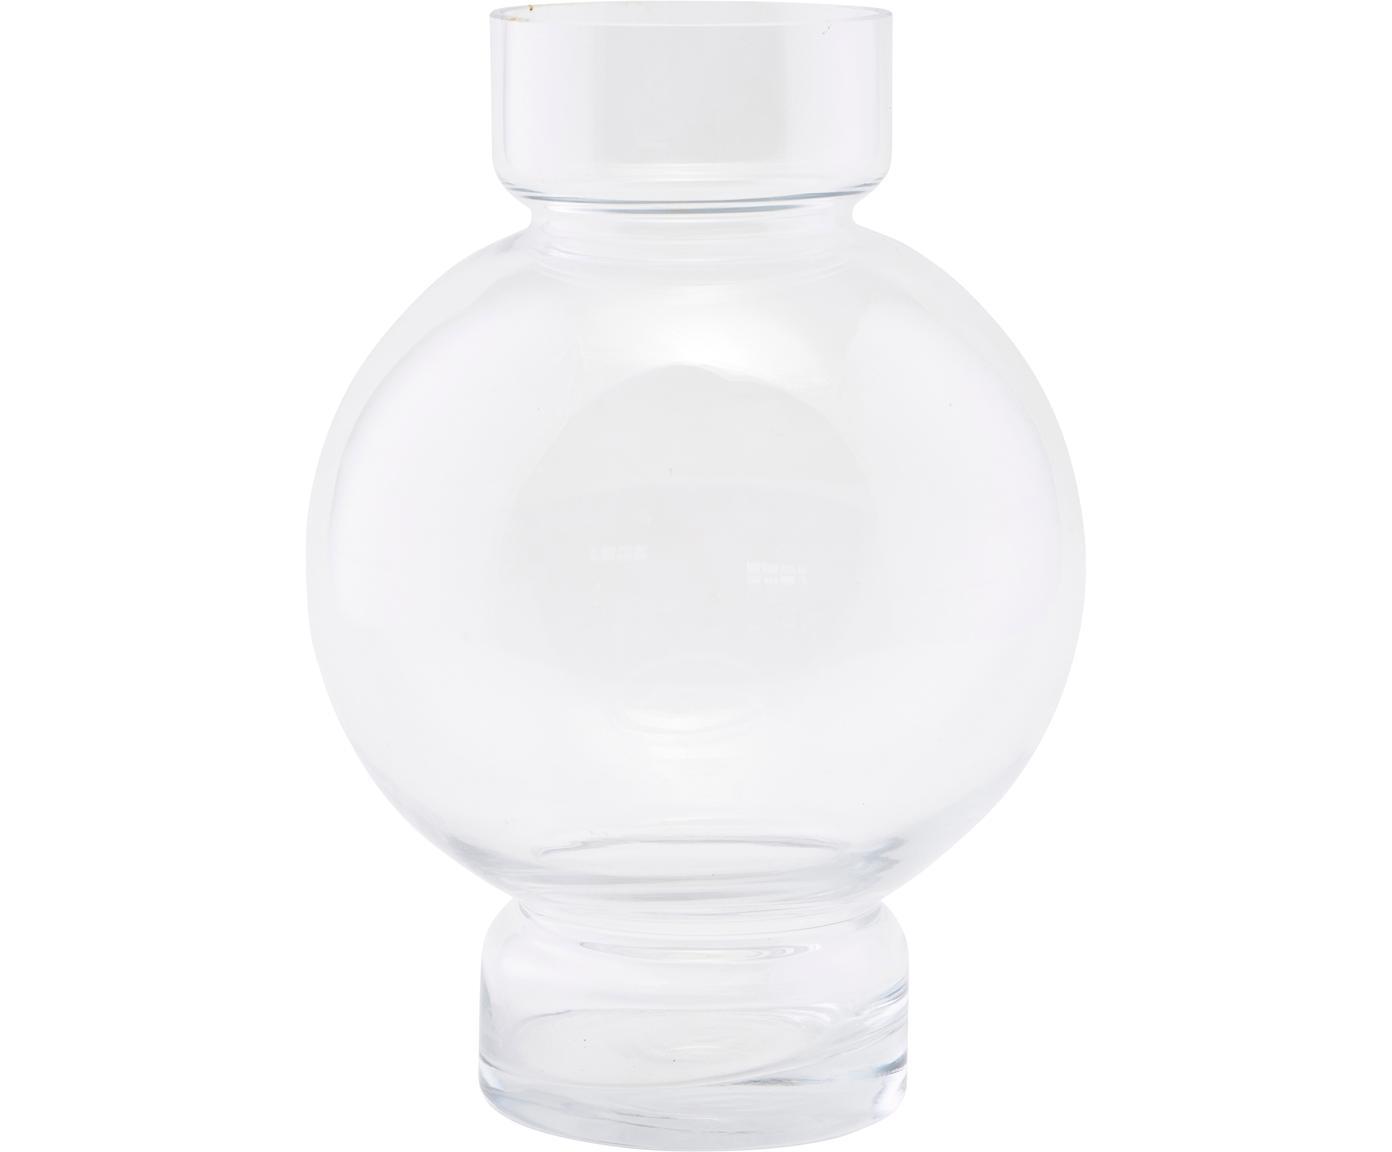 Vaas Bubble, Glas, Transparant, Ø 18 x H 25 cm